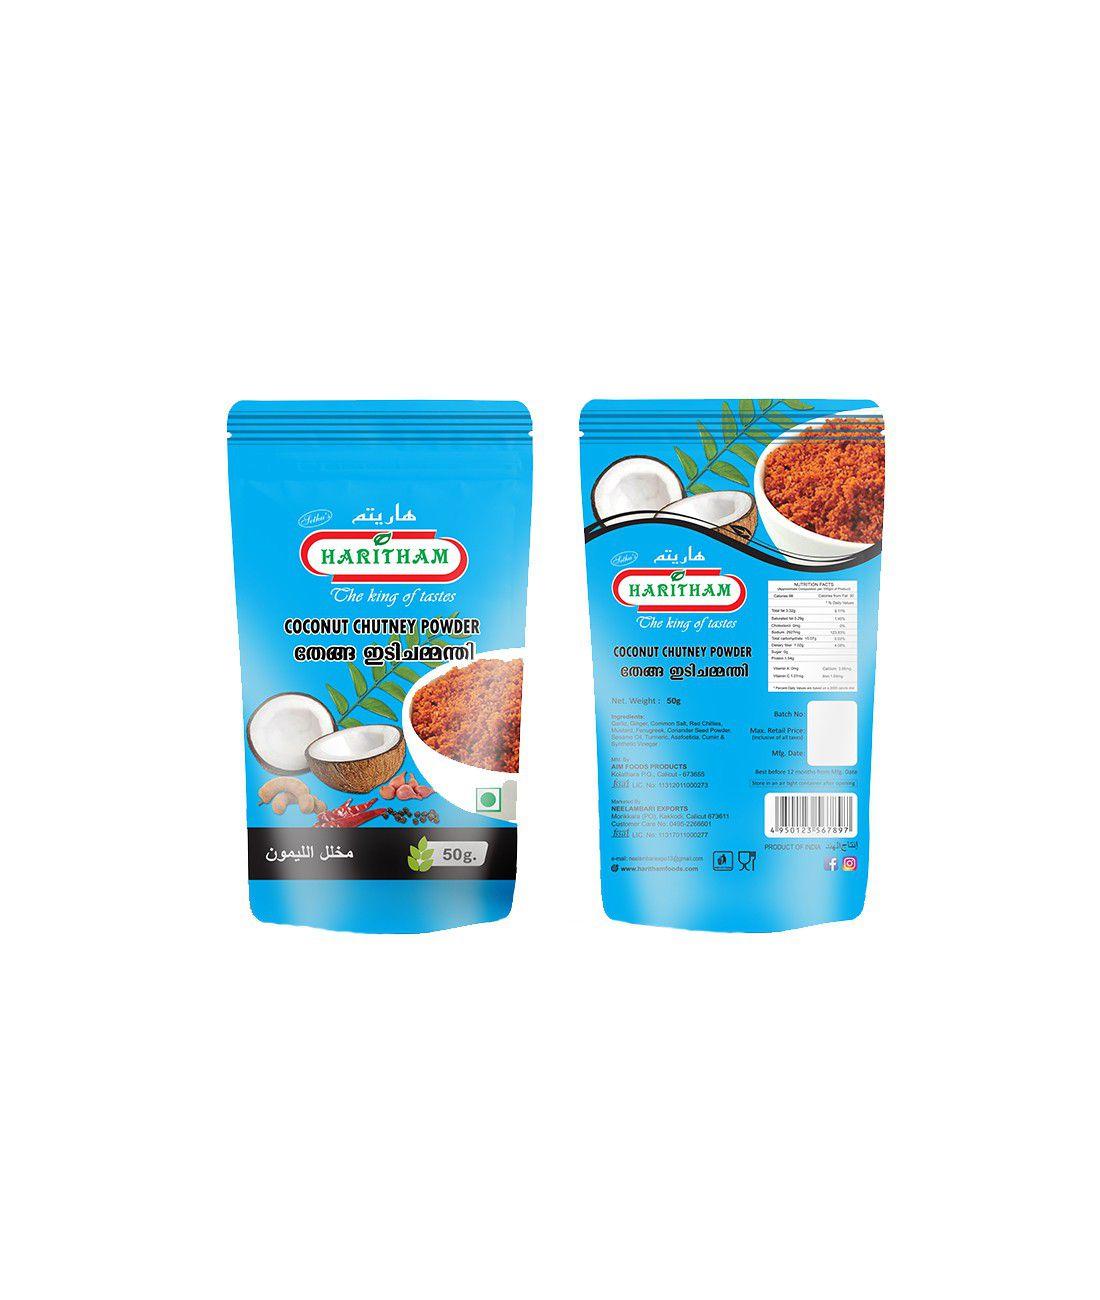 coconut chutney powder